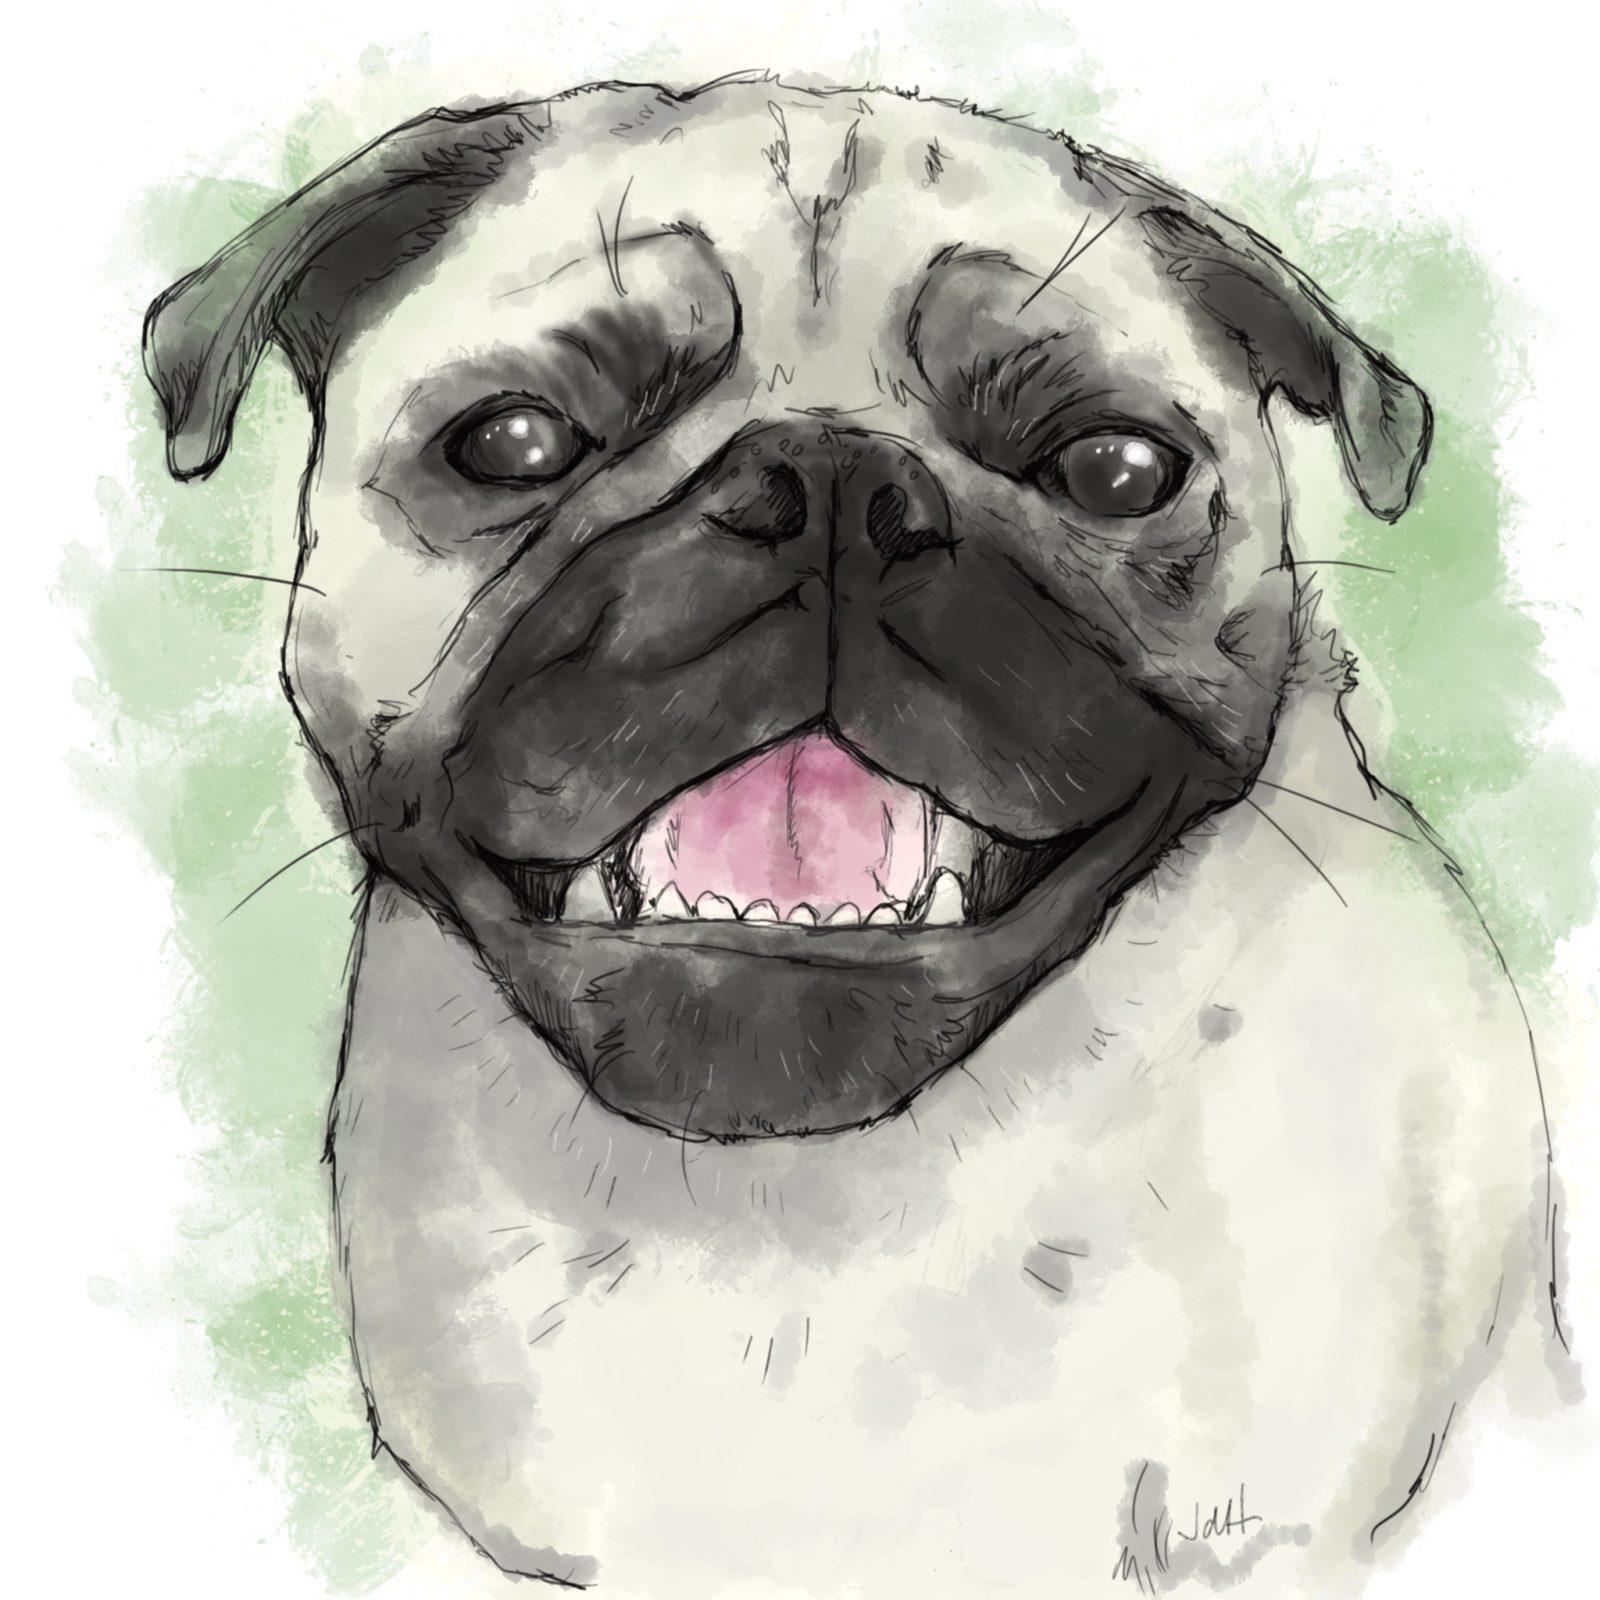 Dog illustration of Pug.